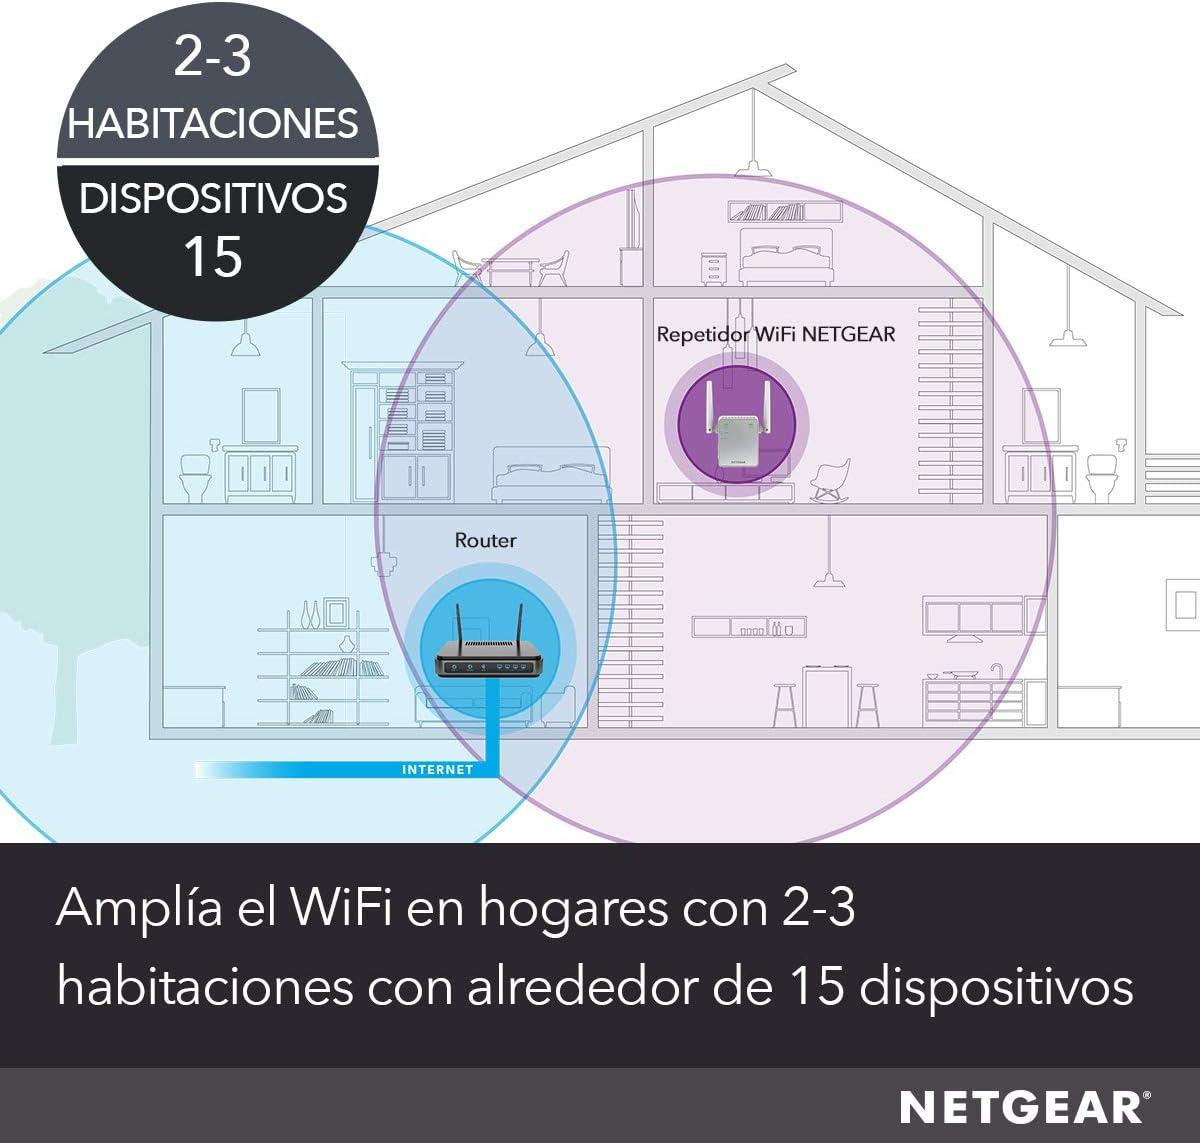 Netgear EX6120 Amplificador de WiFi AC1200 Mbps, repetidor WiFi Dual Band, 1 Puerto